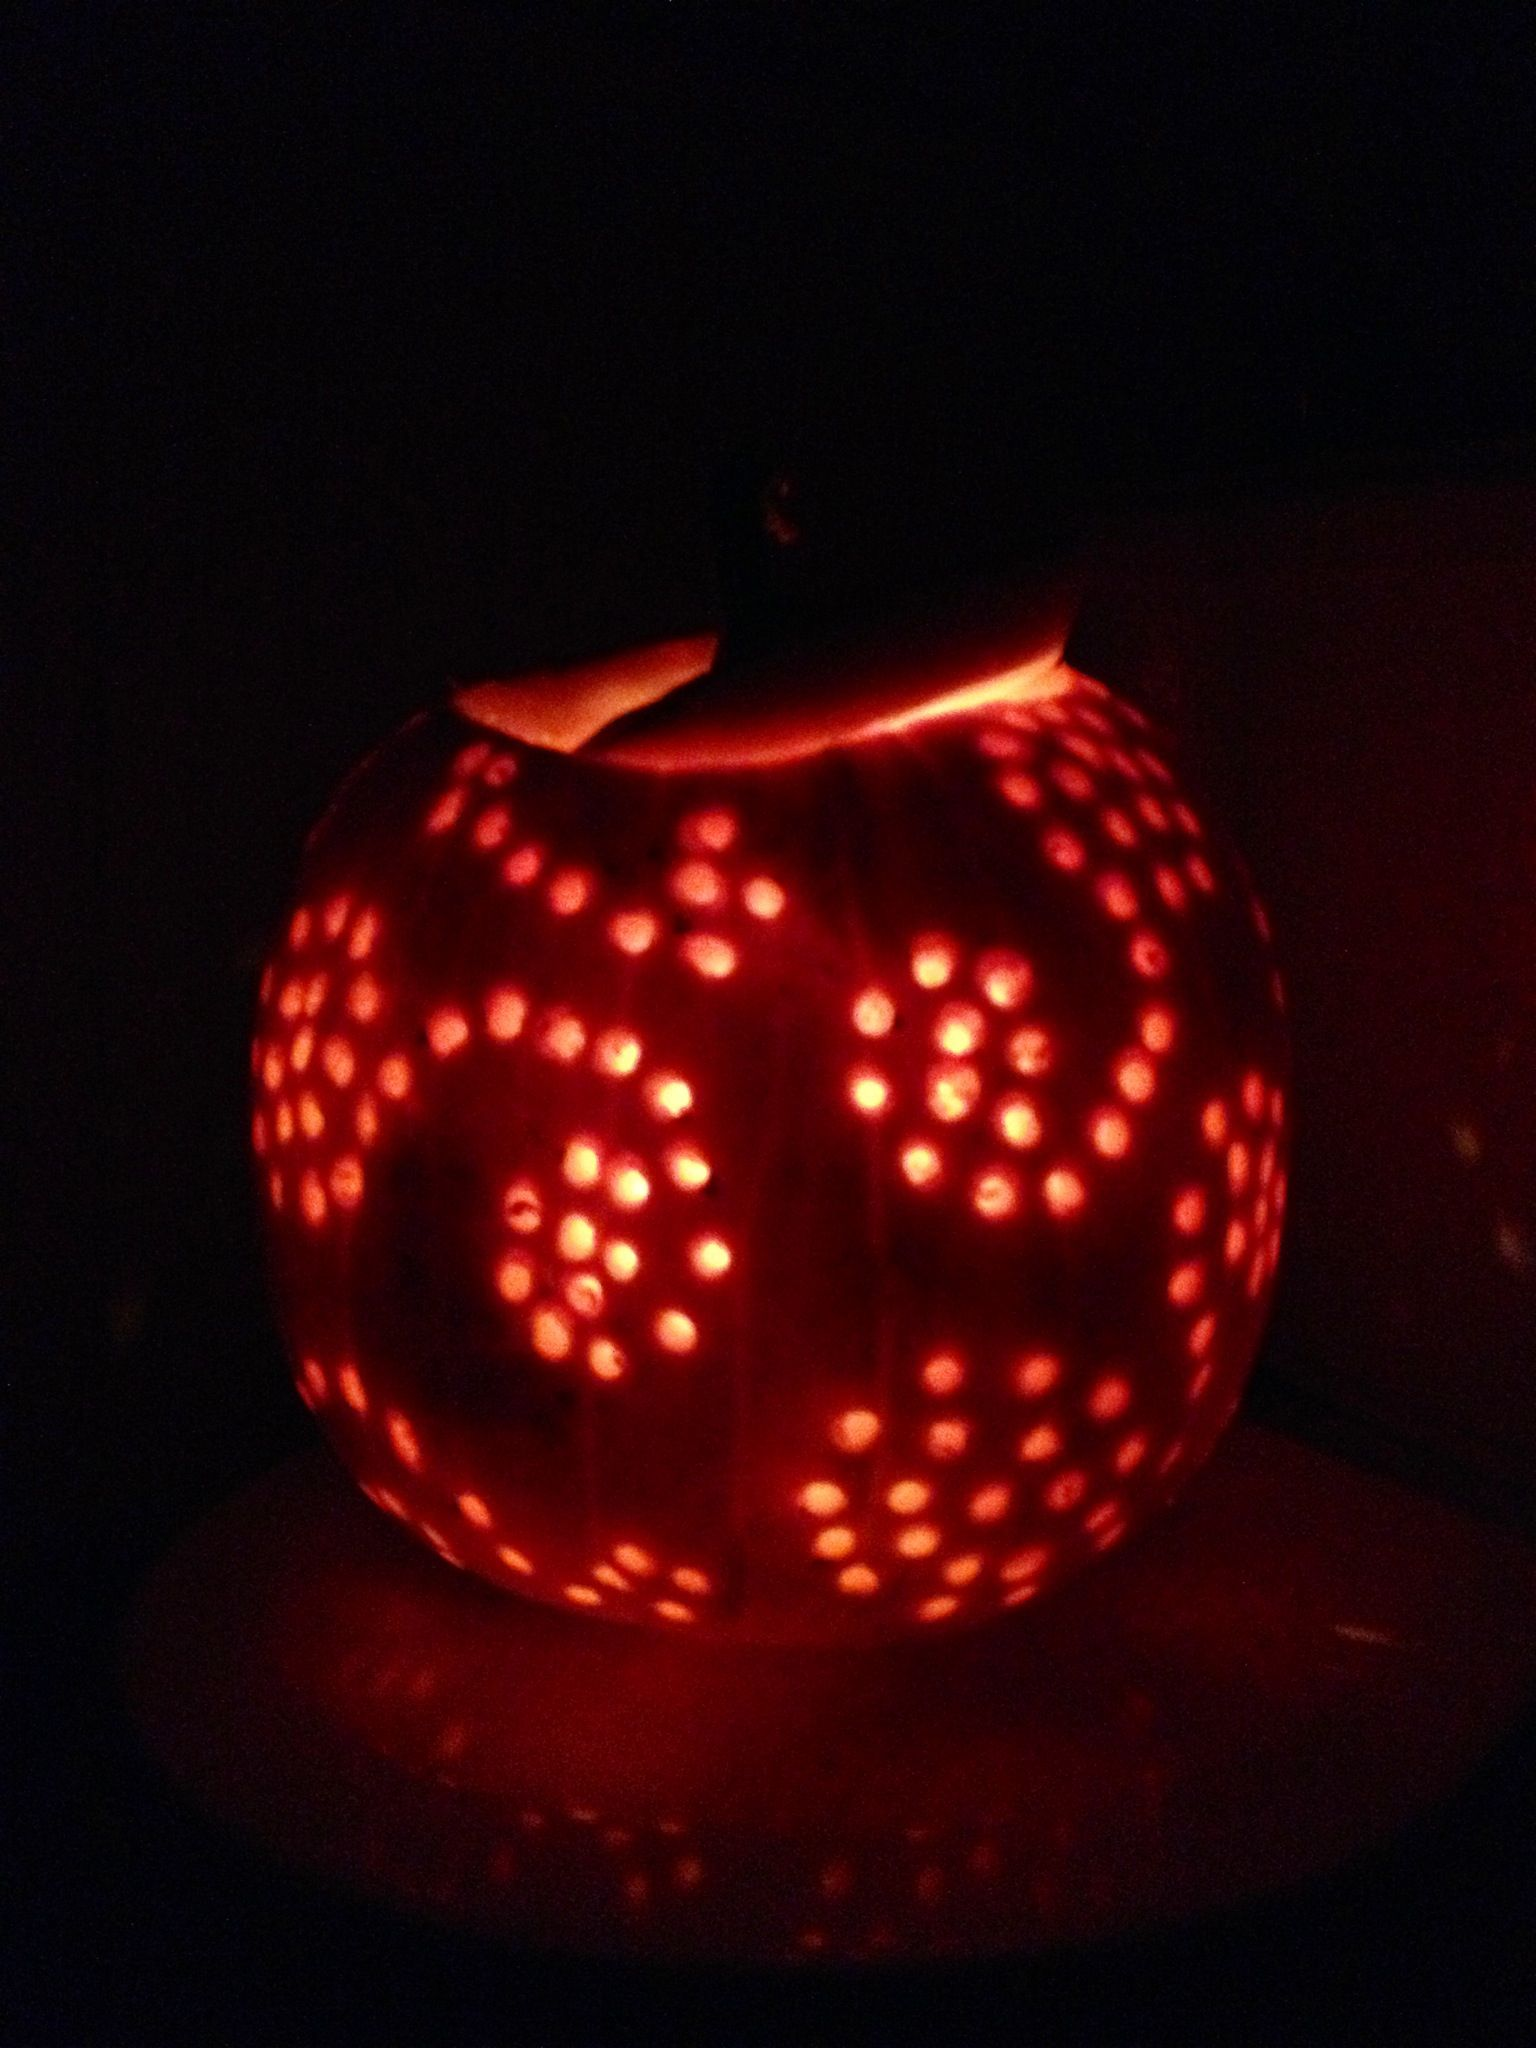 My Pumpkin I Carved First I Made A Design With Black Sharpie Next